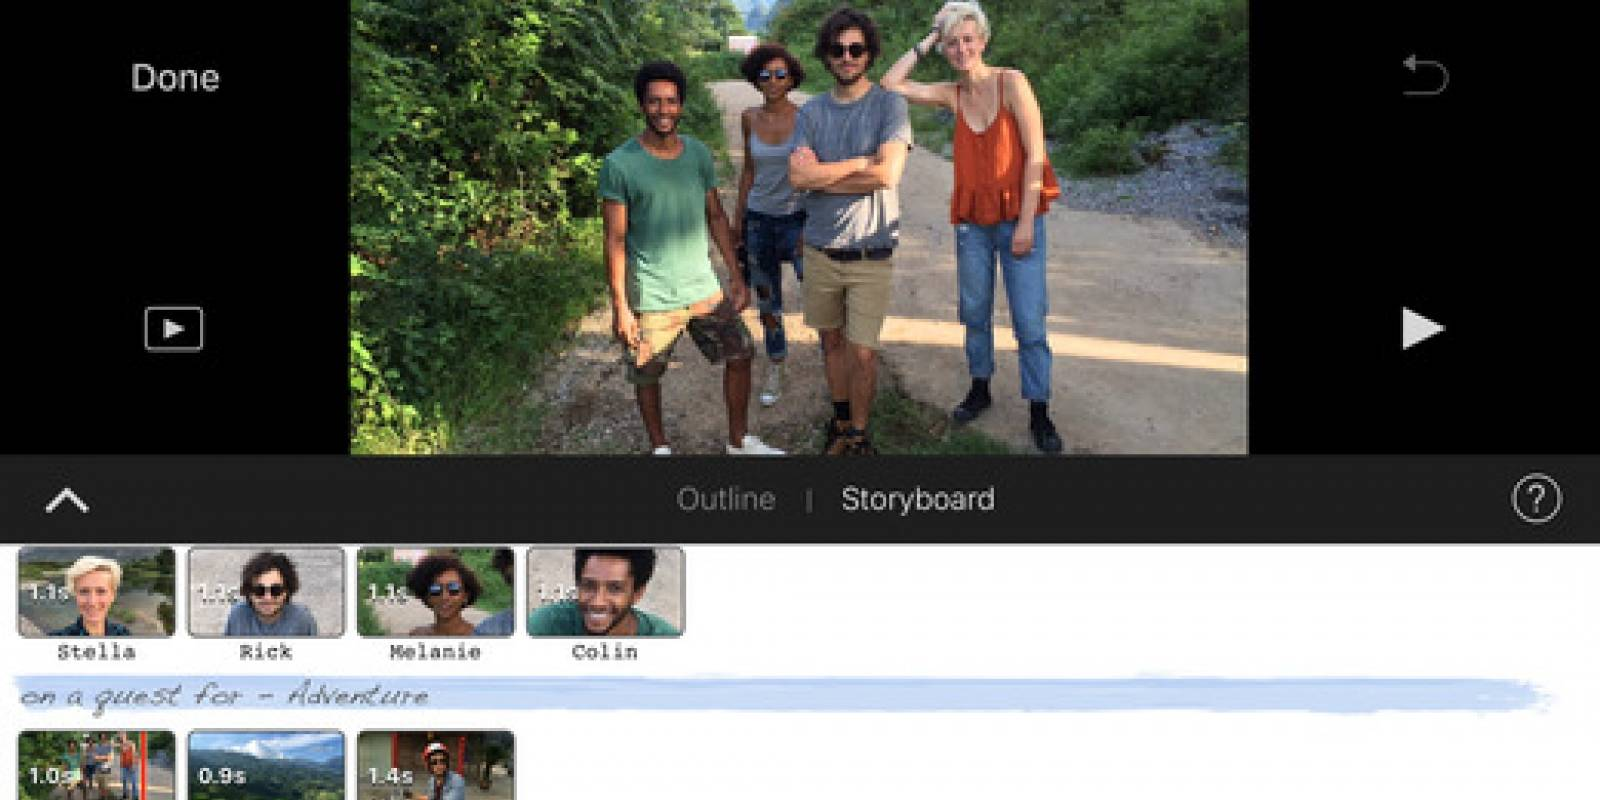 Cómo editar videos desde tu celular? | Metro Ecuador